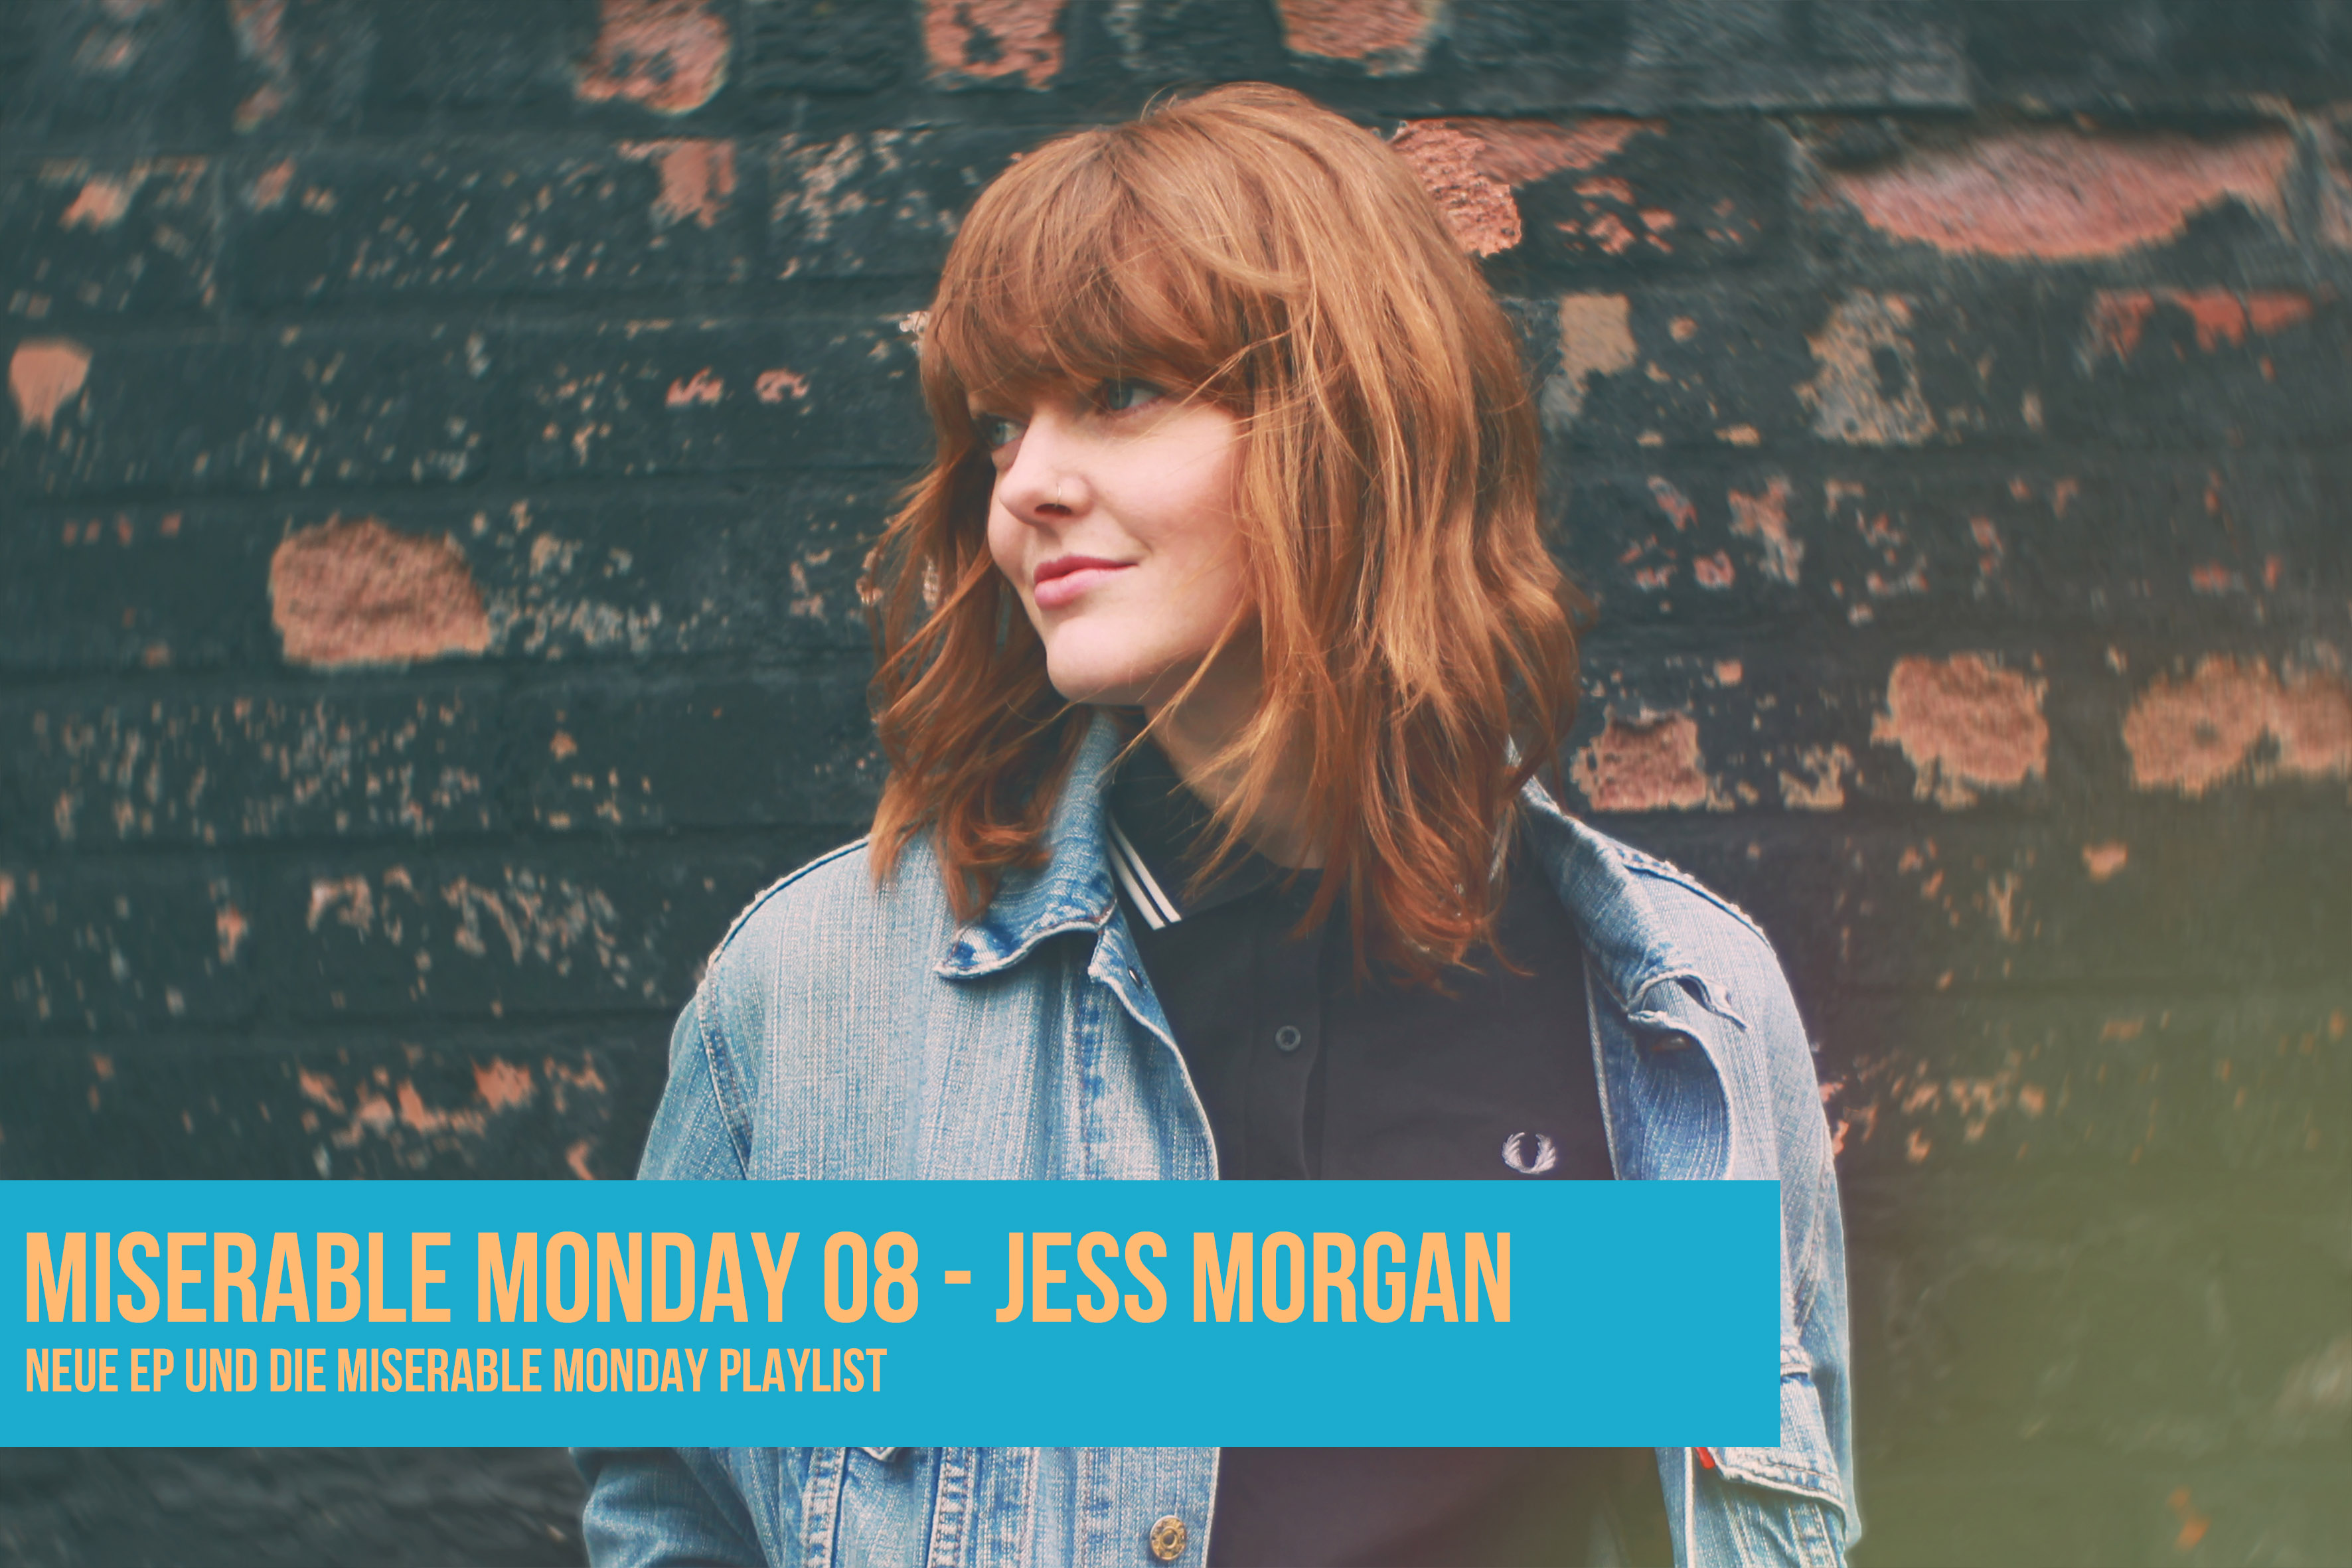 008 - Jess Morgan